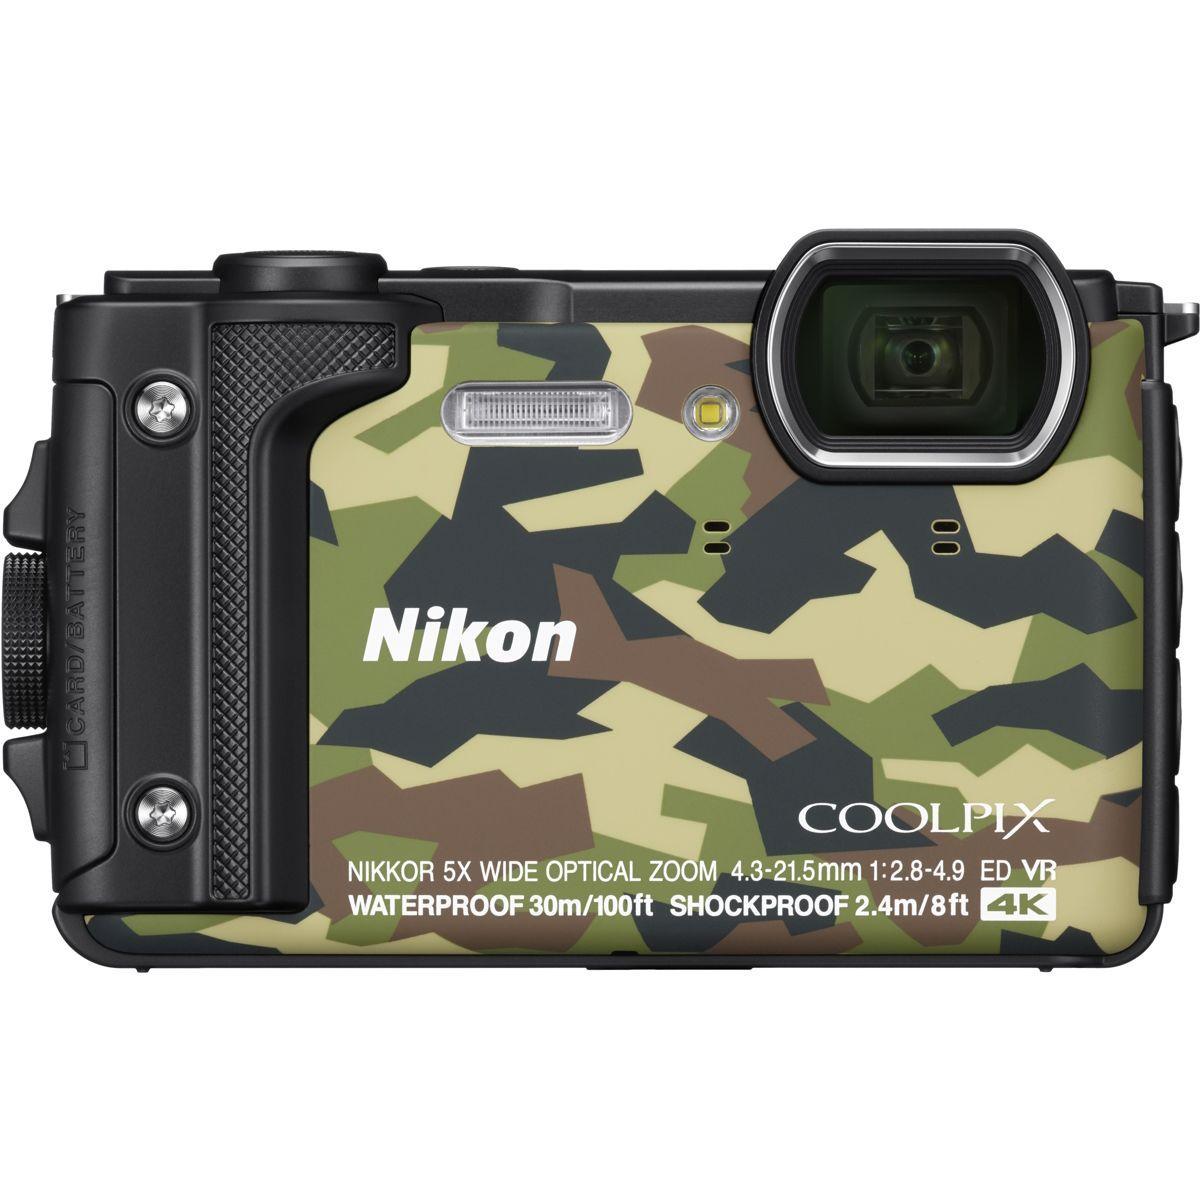 Appareil photo compact nikon coolpix w300 camouflage + sac �tanche (photo)